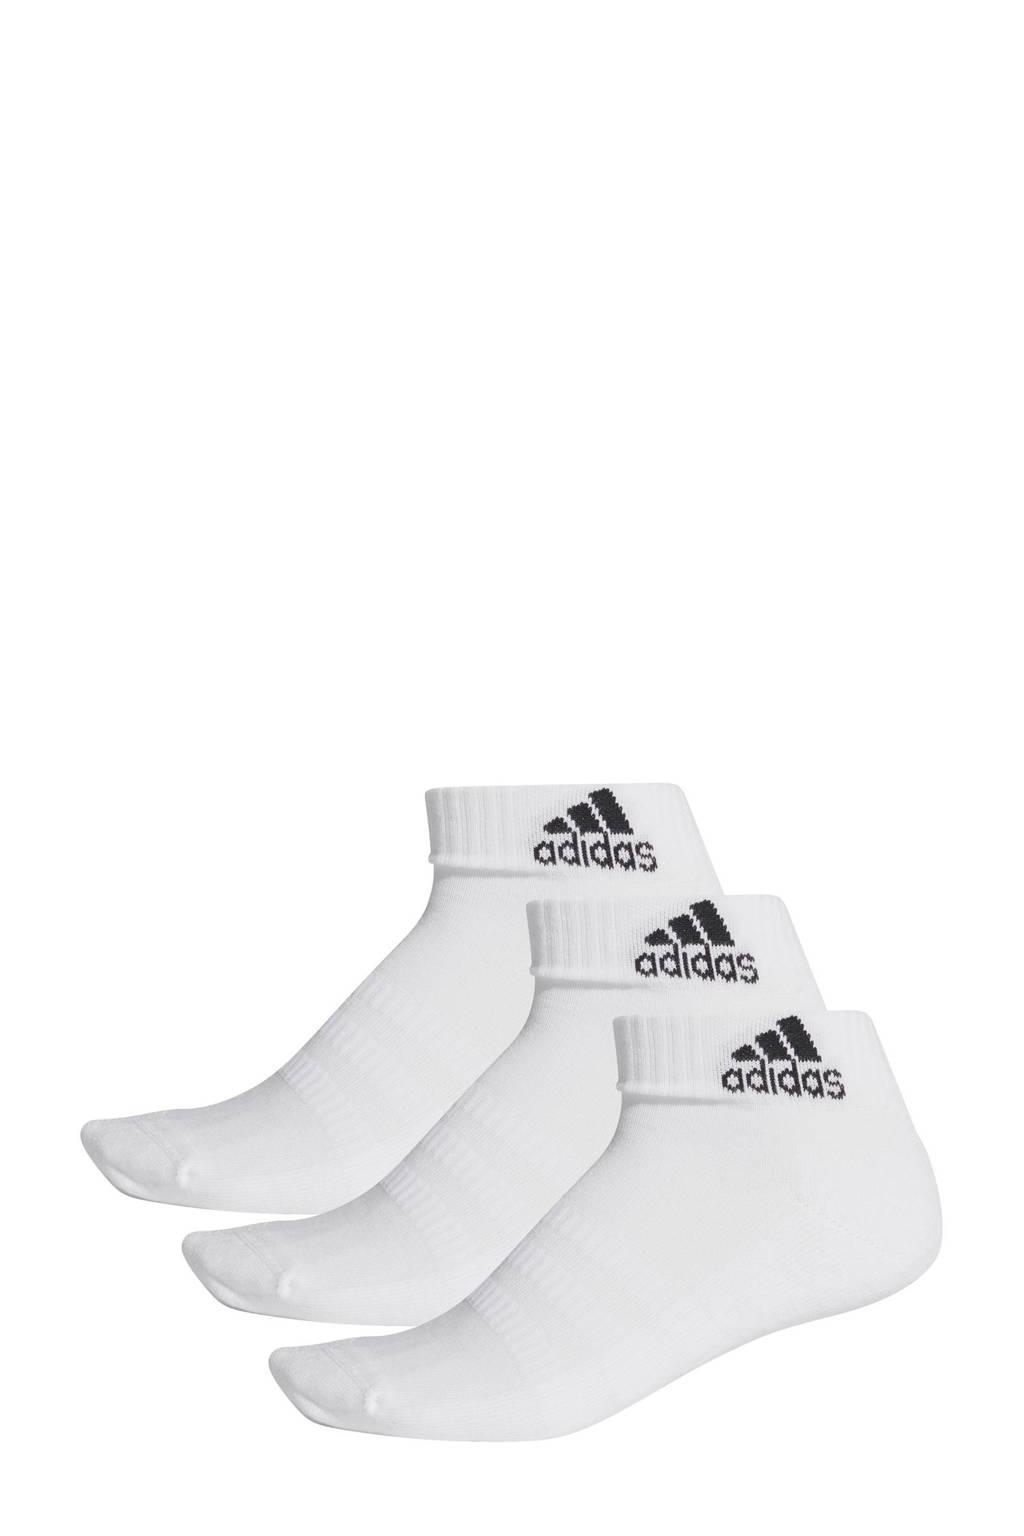 adidas Performance   sportsokken - set van 3 wit, Wit/zwart